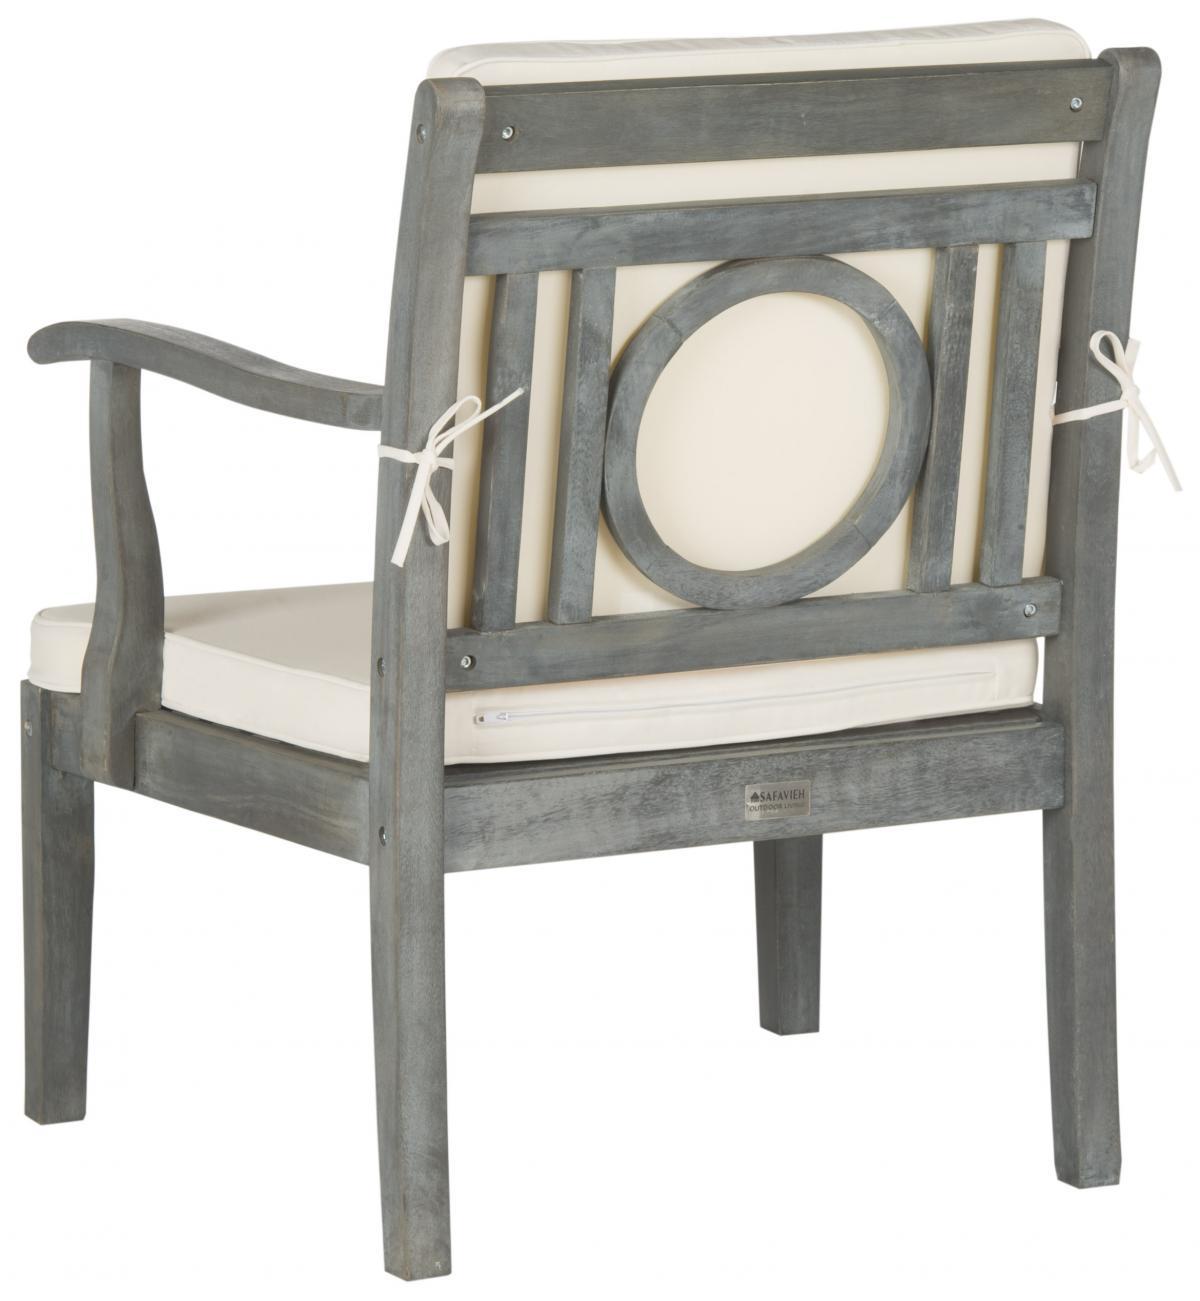 Pat6712b Patio Sets 4 Piece Furniture By Safavieh